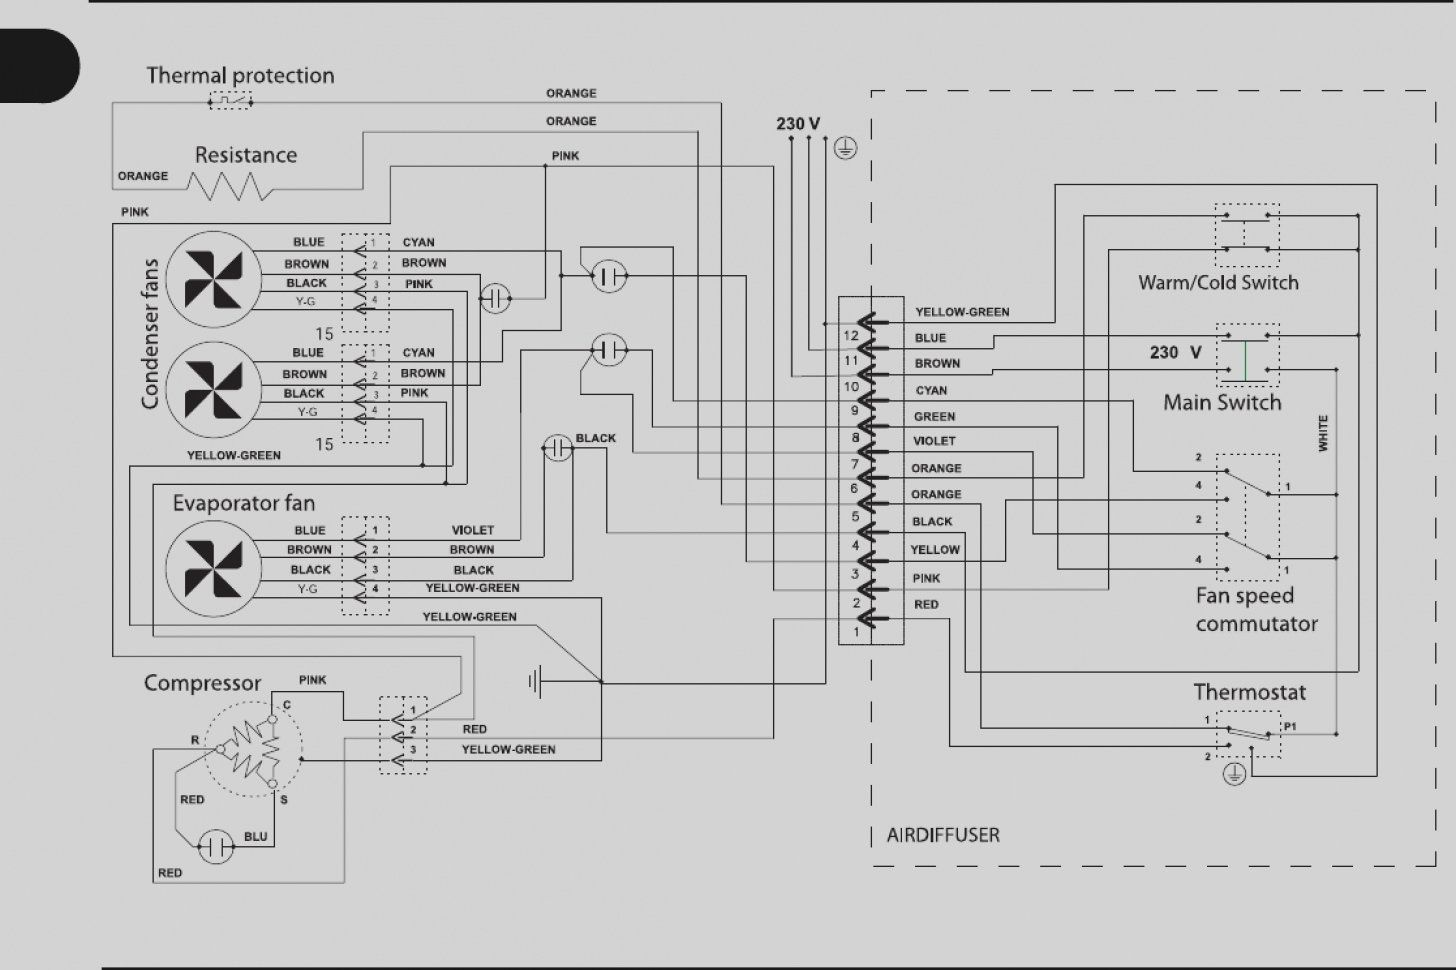 Dometic Ac Thermostat Wiring Diagram How To A Sentence Worksheet 19 Artatec Automobile De Duo Therm Rv Dia Smart Diagrams U2022 Regarding Rh Pinterest Com Rooftop